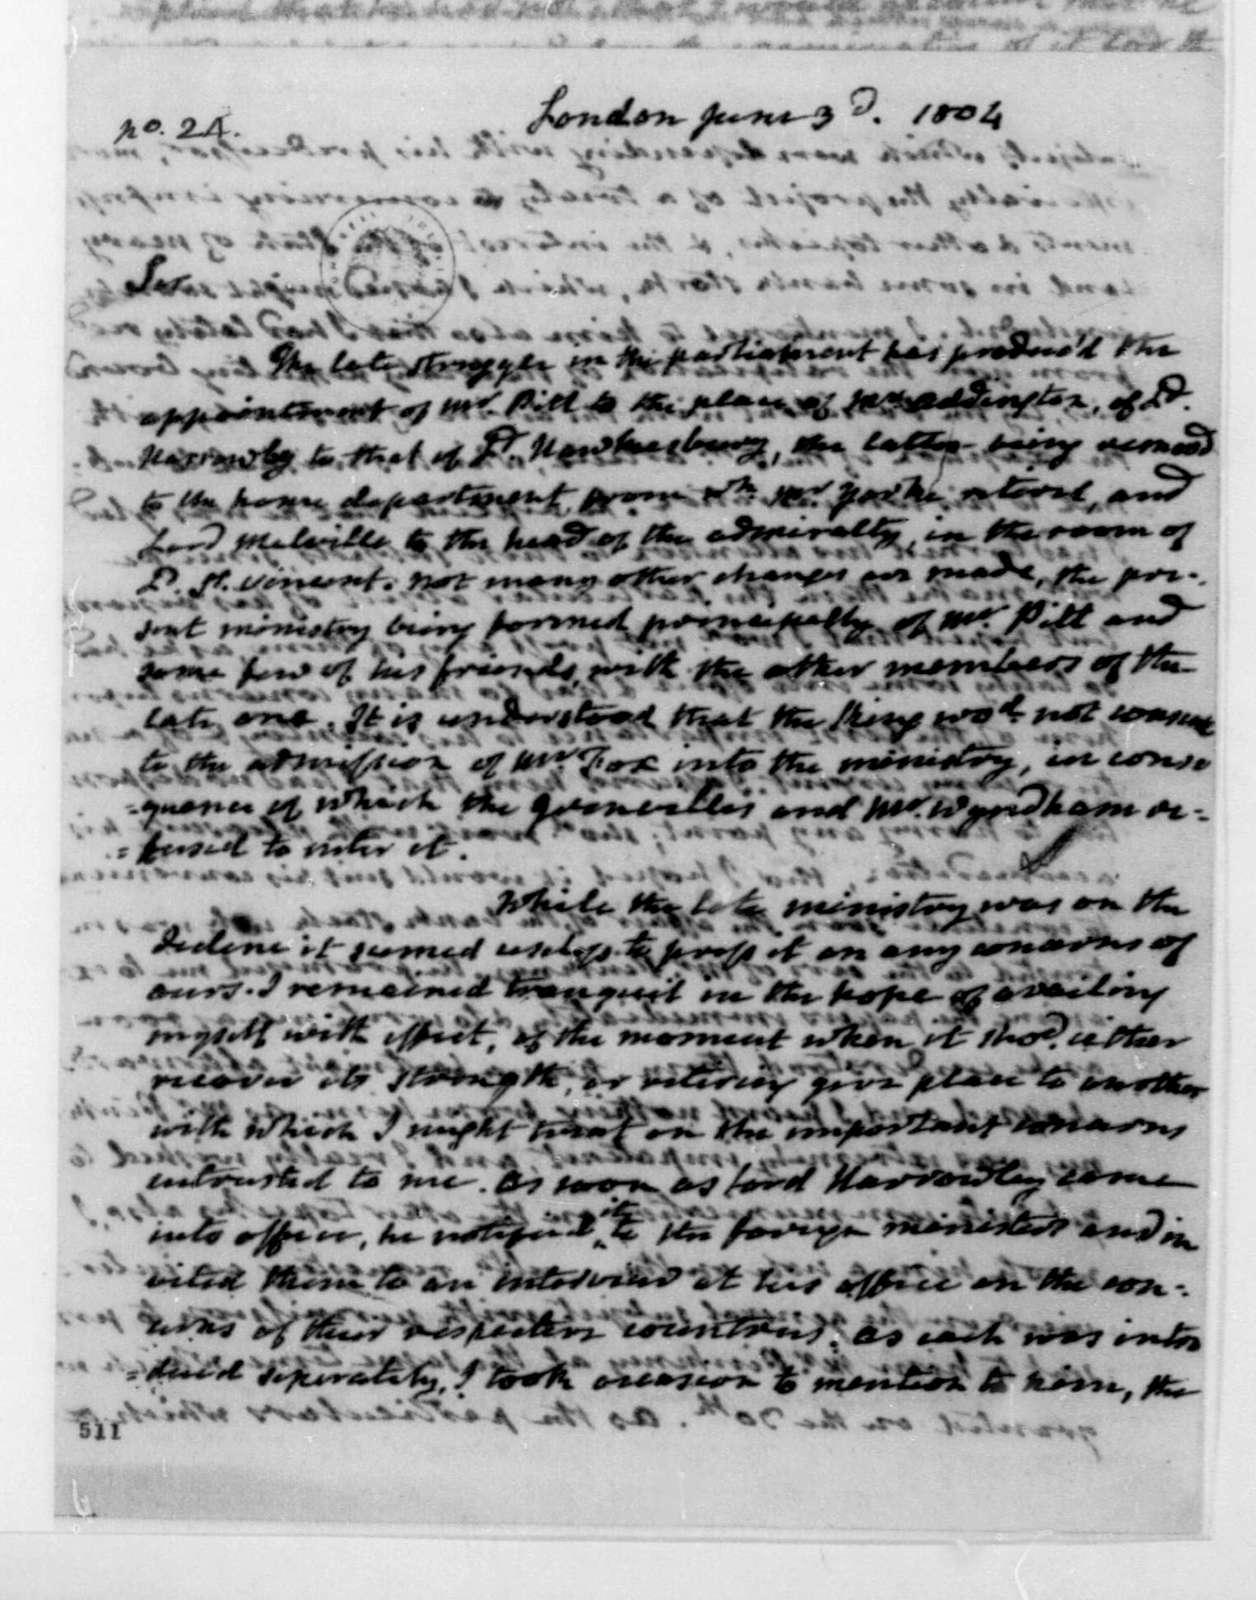 James Monroe to James Madison, June 3, 1804.